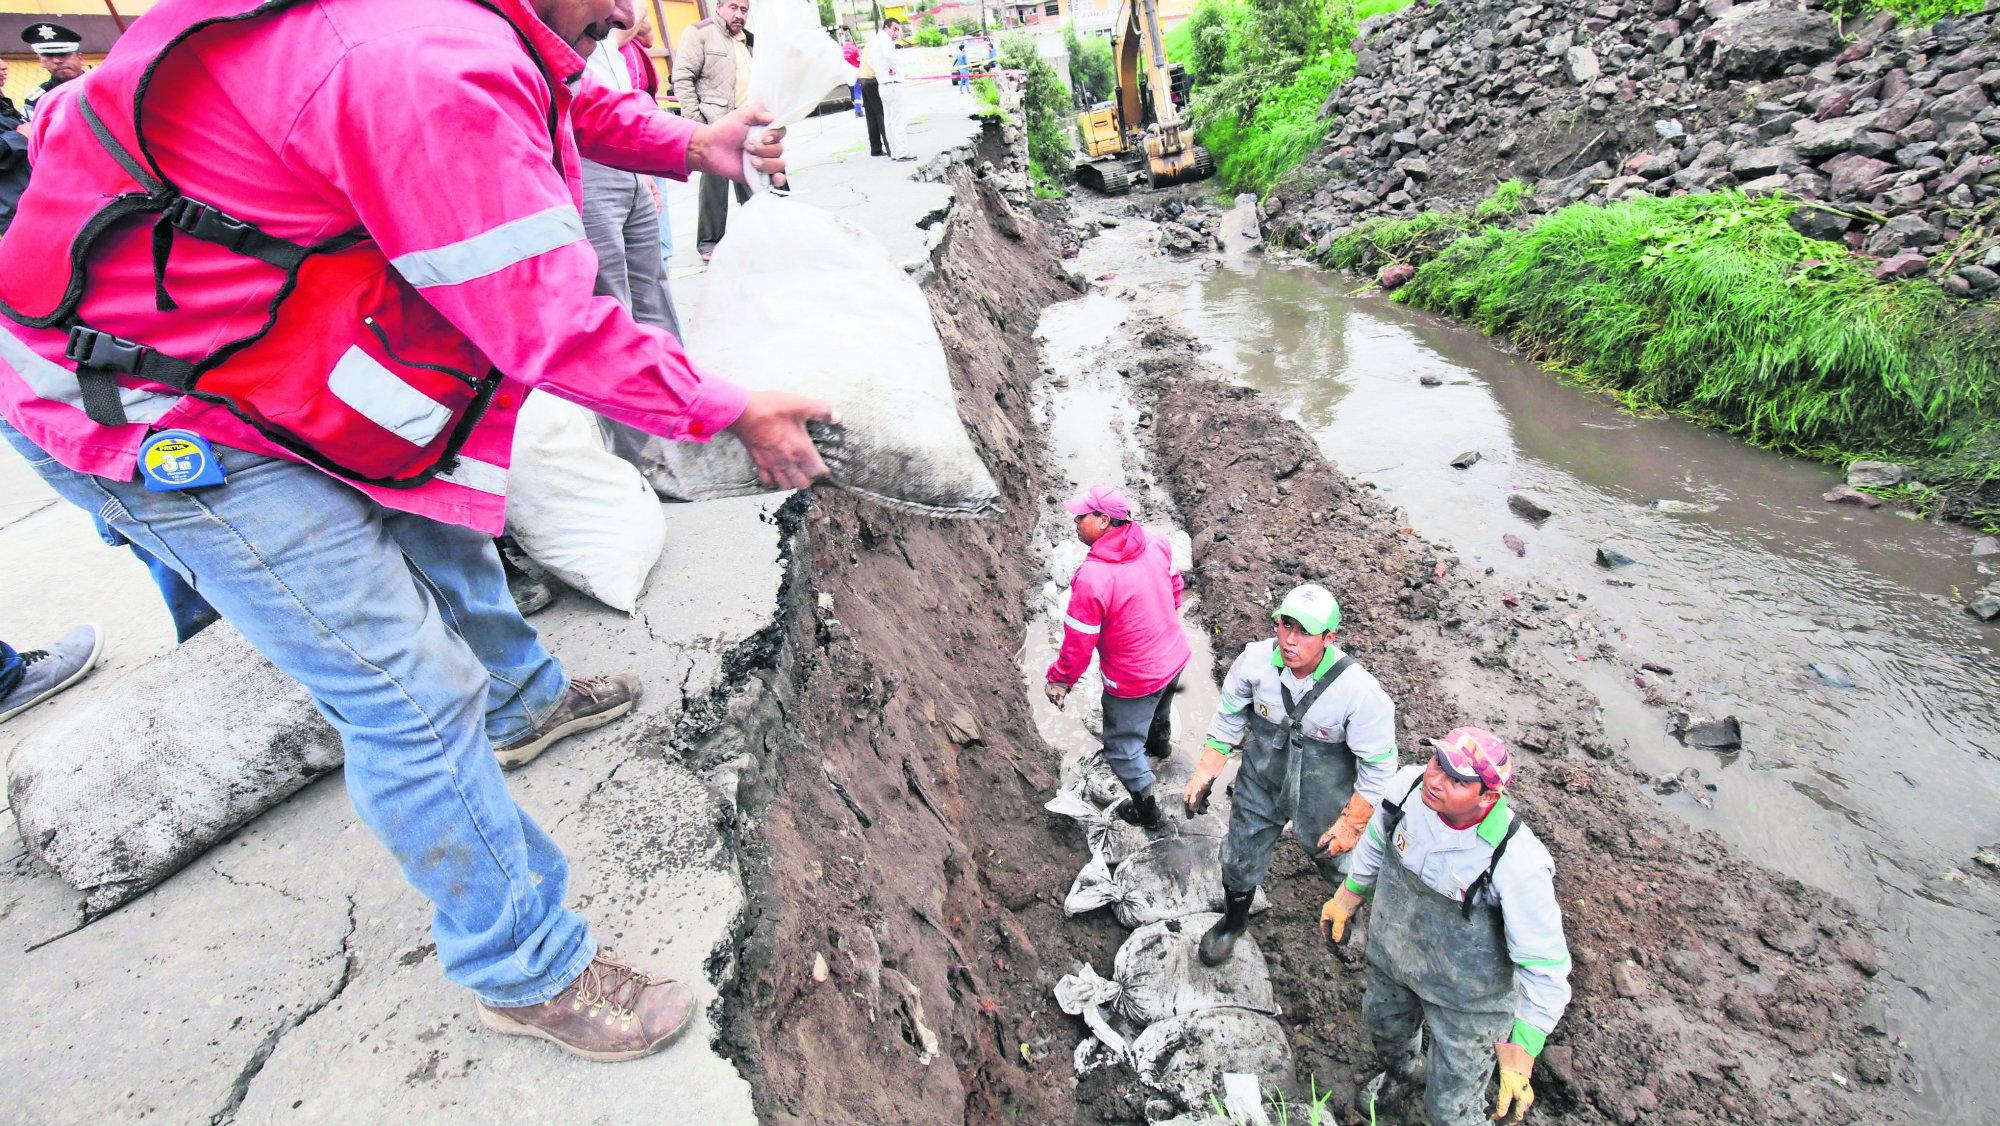 Río Verdiguel Colapso Bomba de timepo Edomex Toluca